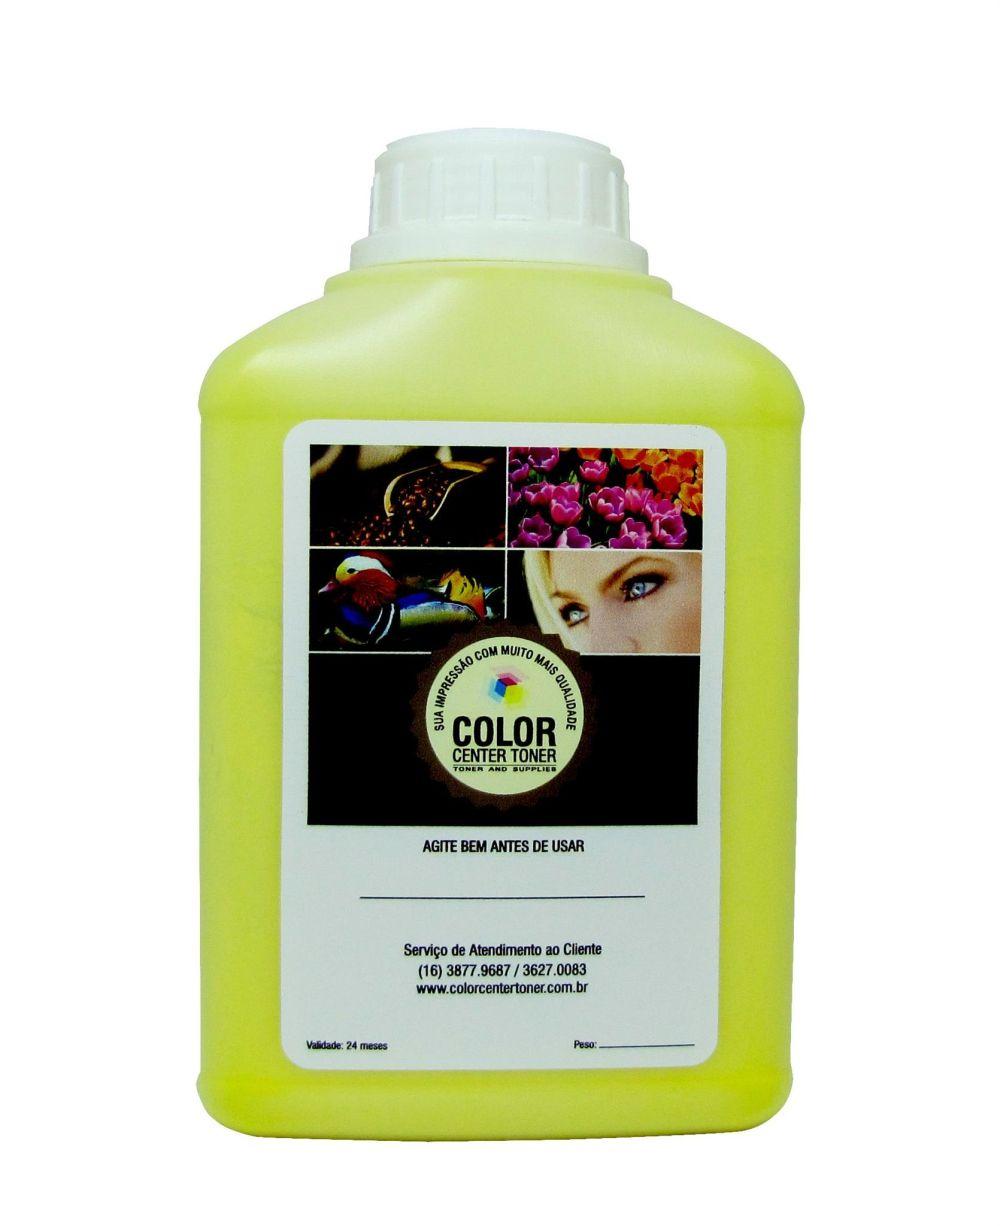 Refil de Toner Minolta 7450 séries Amarelo